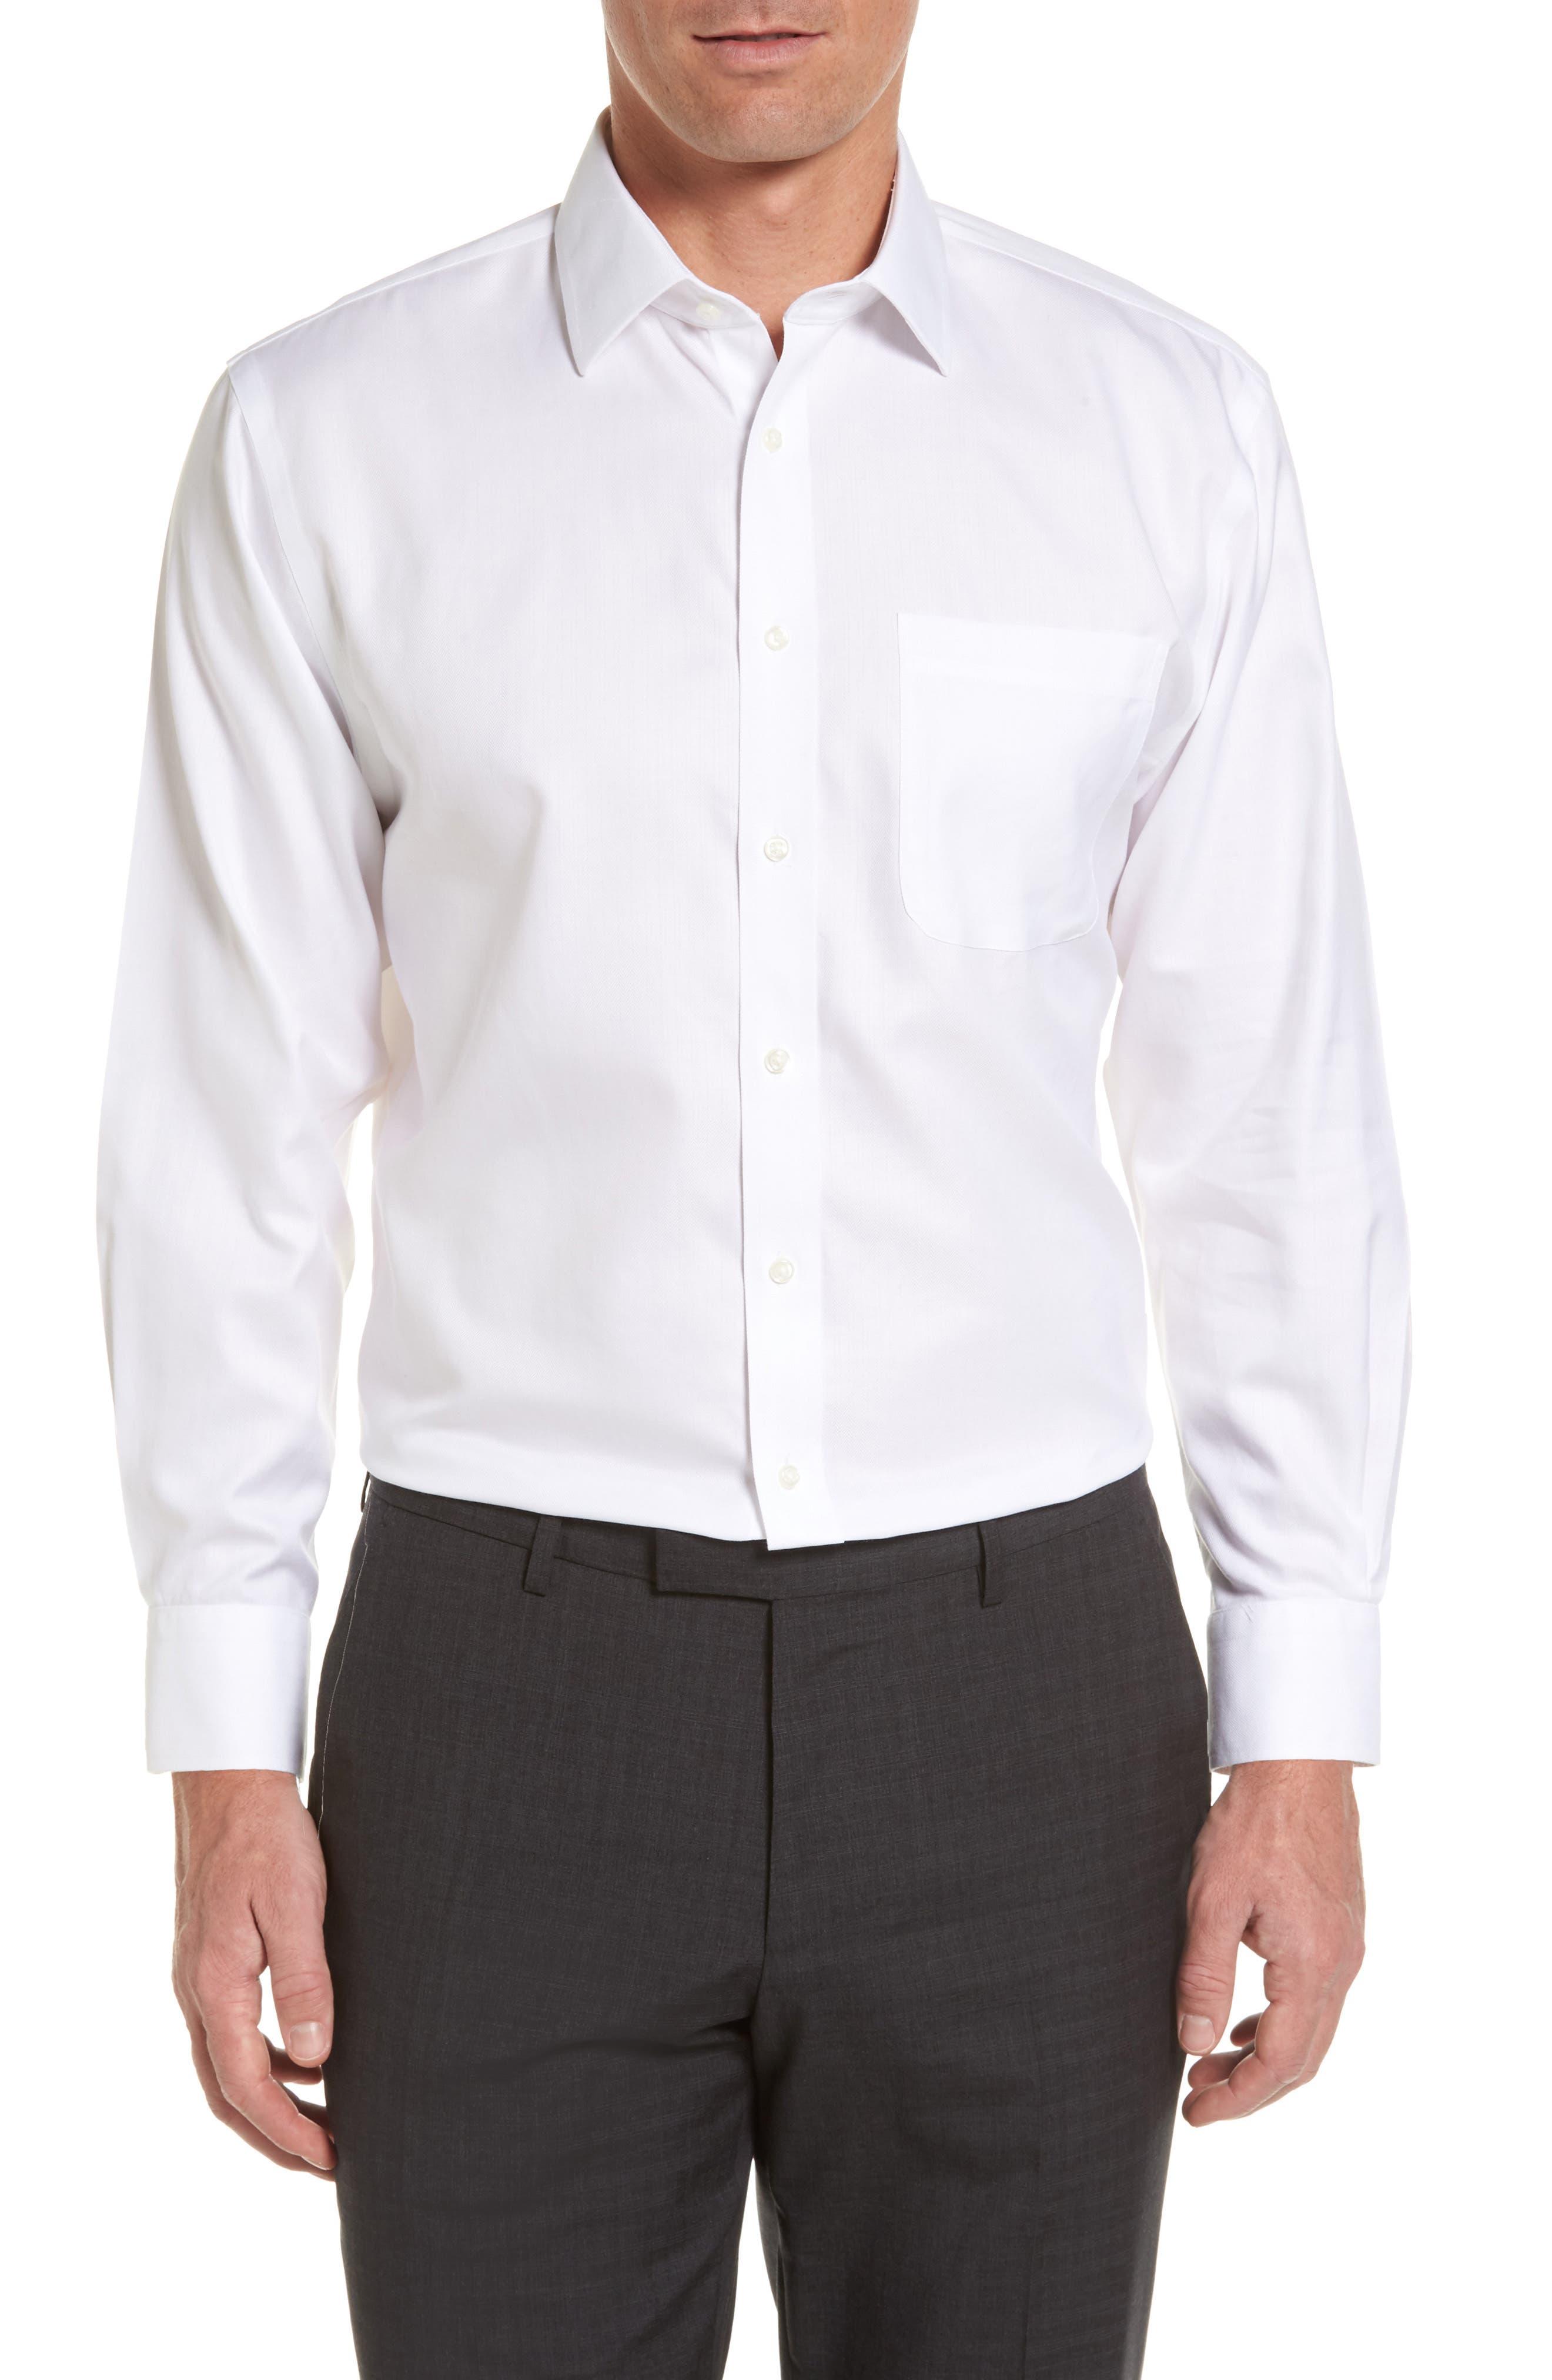 Smartcare<sup>™</sup> Traditional Fit Herringbone Dress Shirt,                             Main thumbnail 1, color,                             White